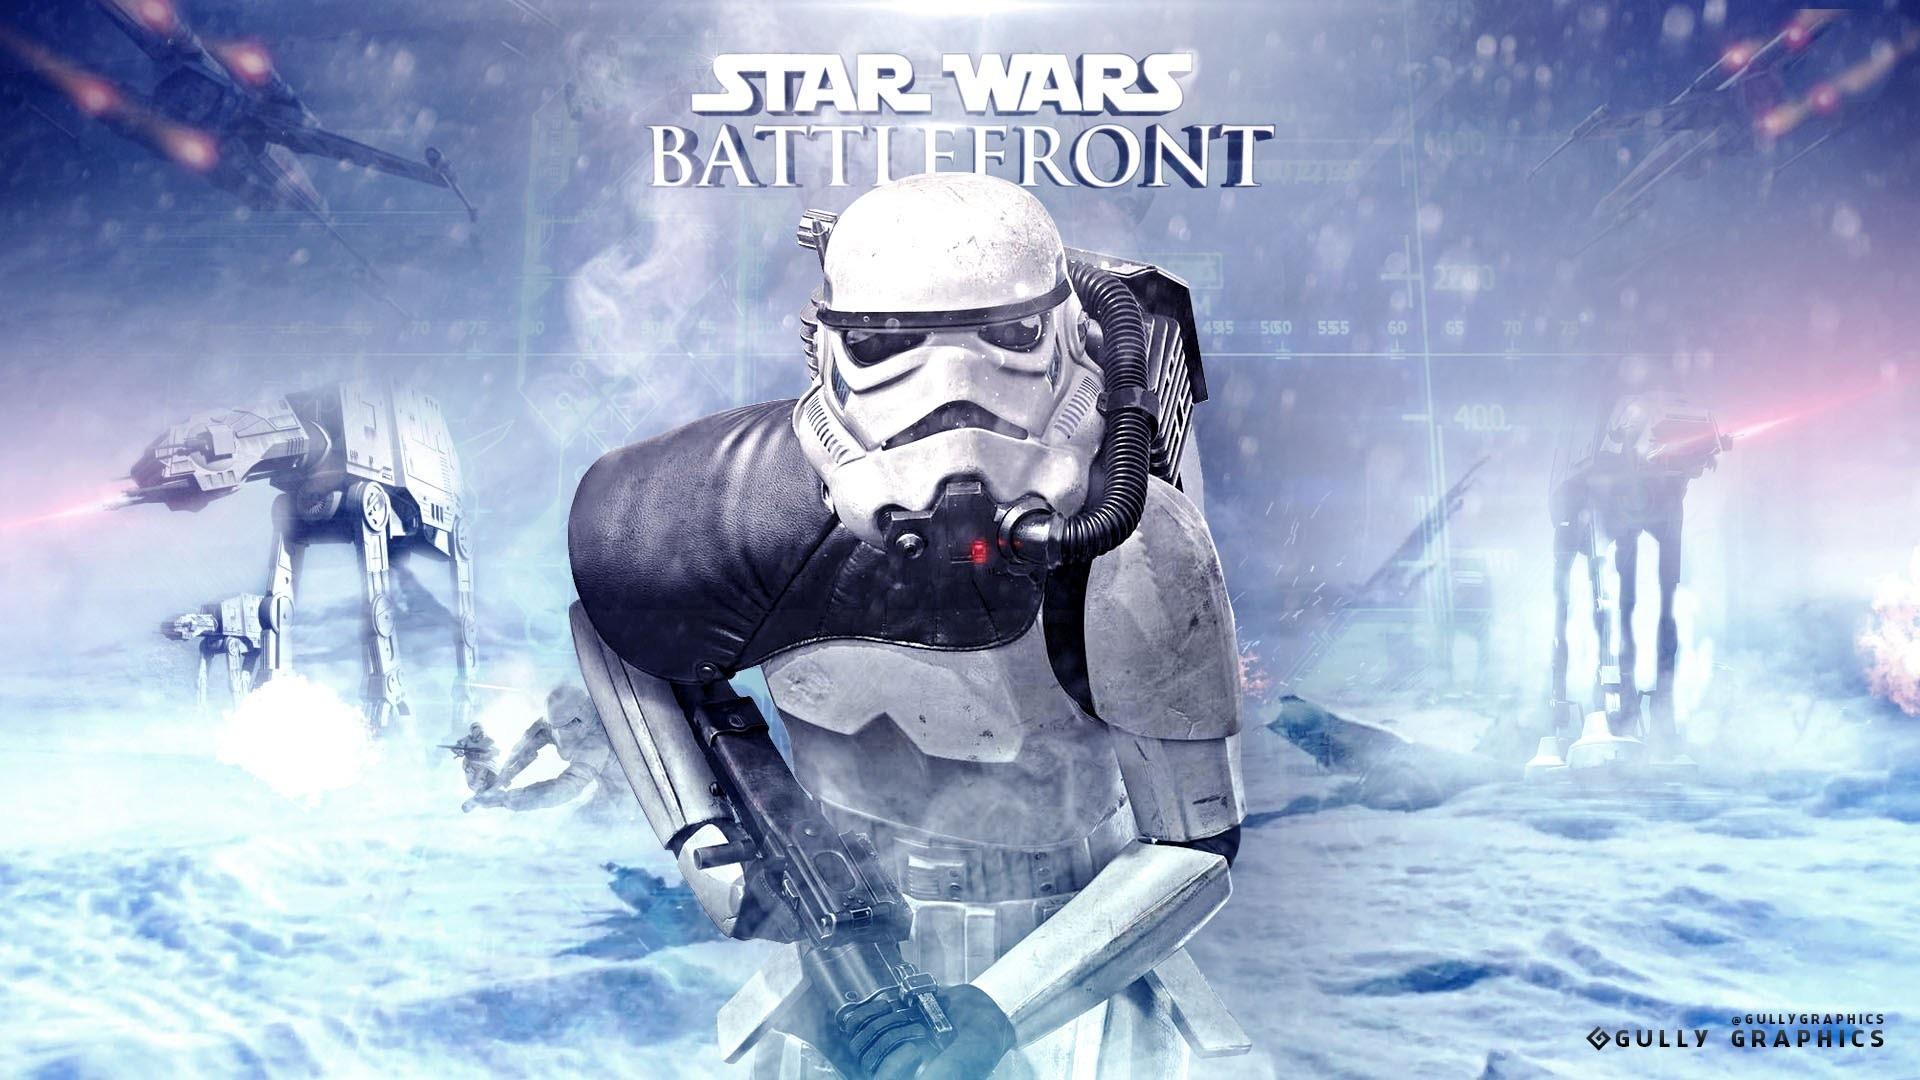 Star Wars Battlefield Wallpaper 70 Images